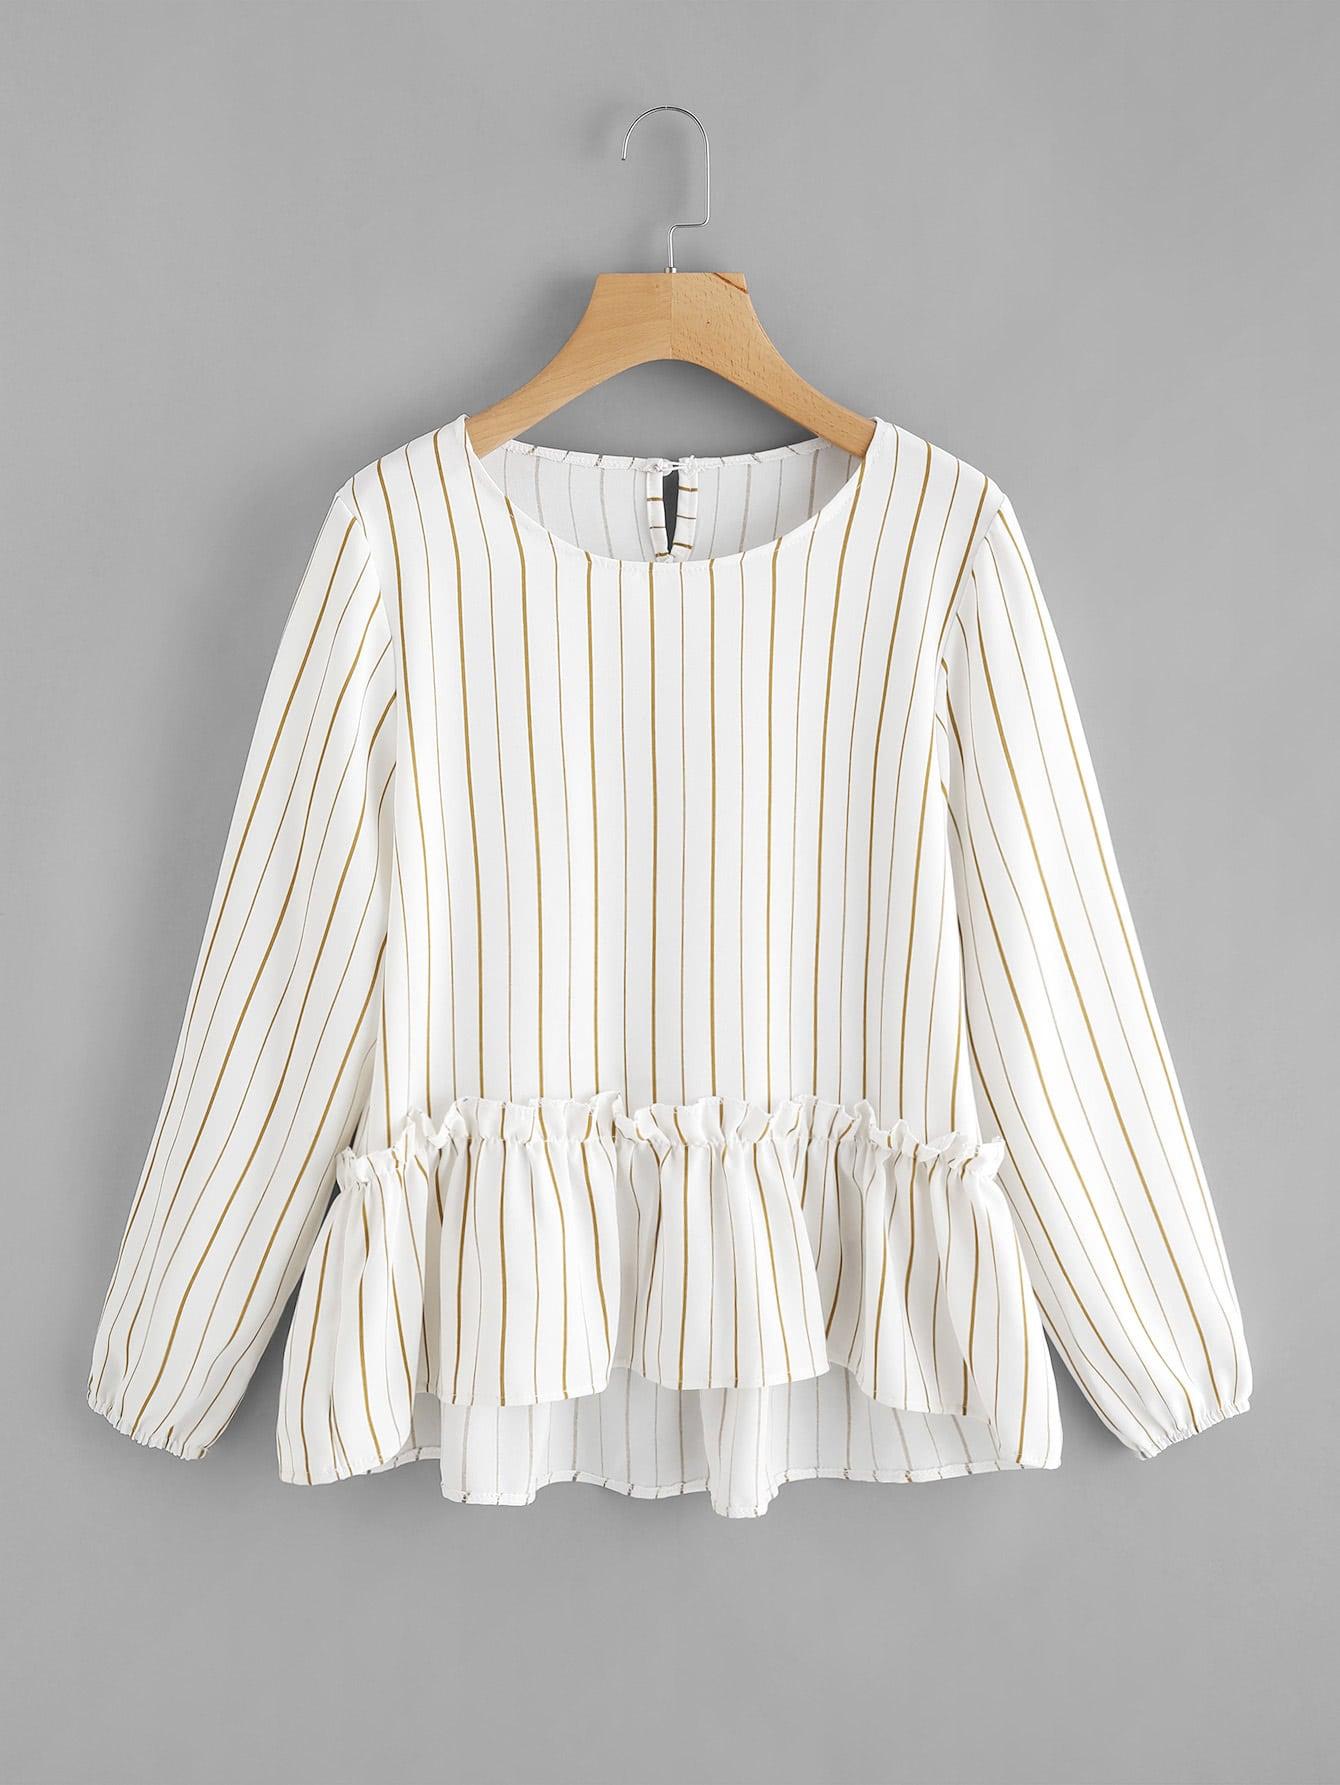 Vertical Striped Frill Hem Babydoll Blouse contrast striped knotted hem frill blouse